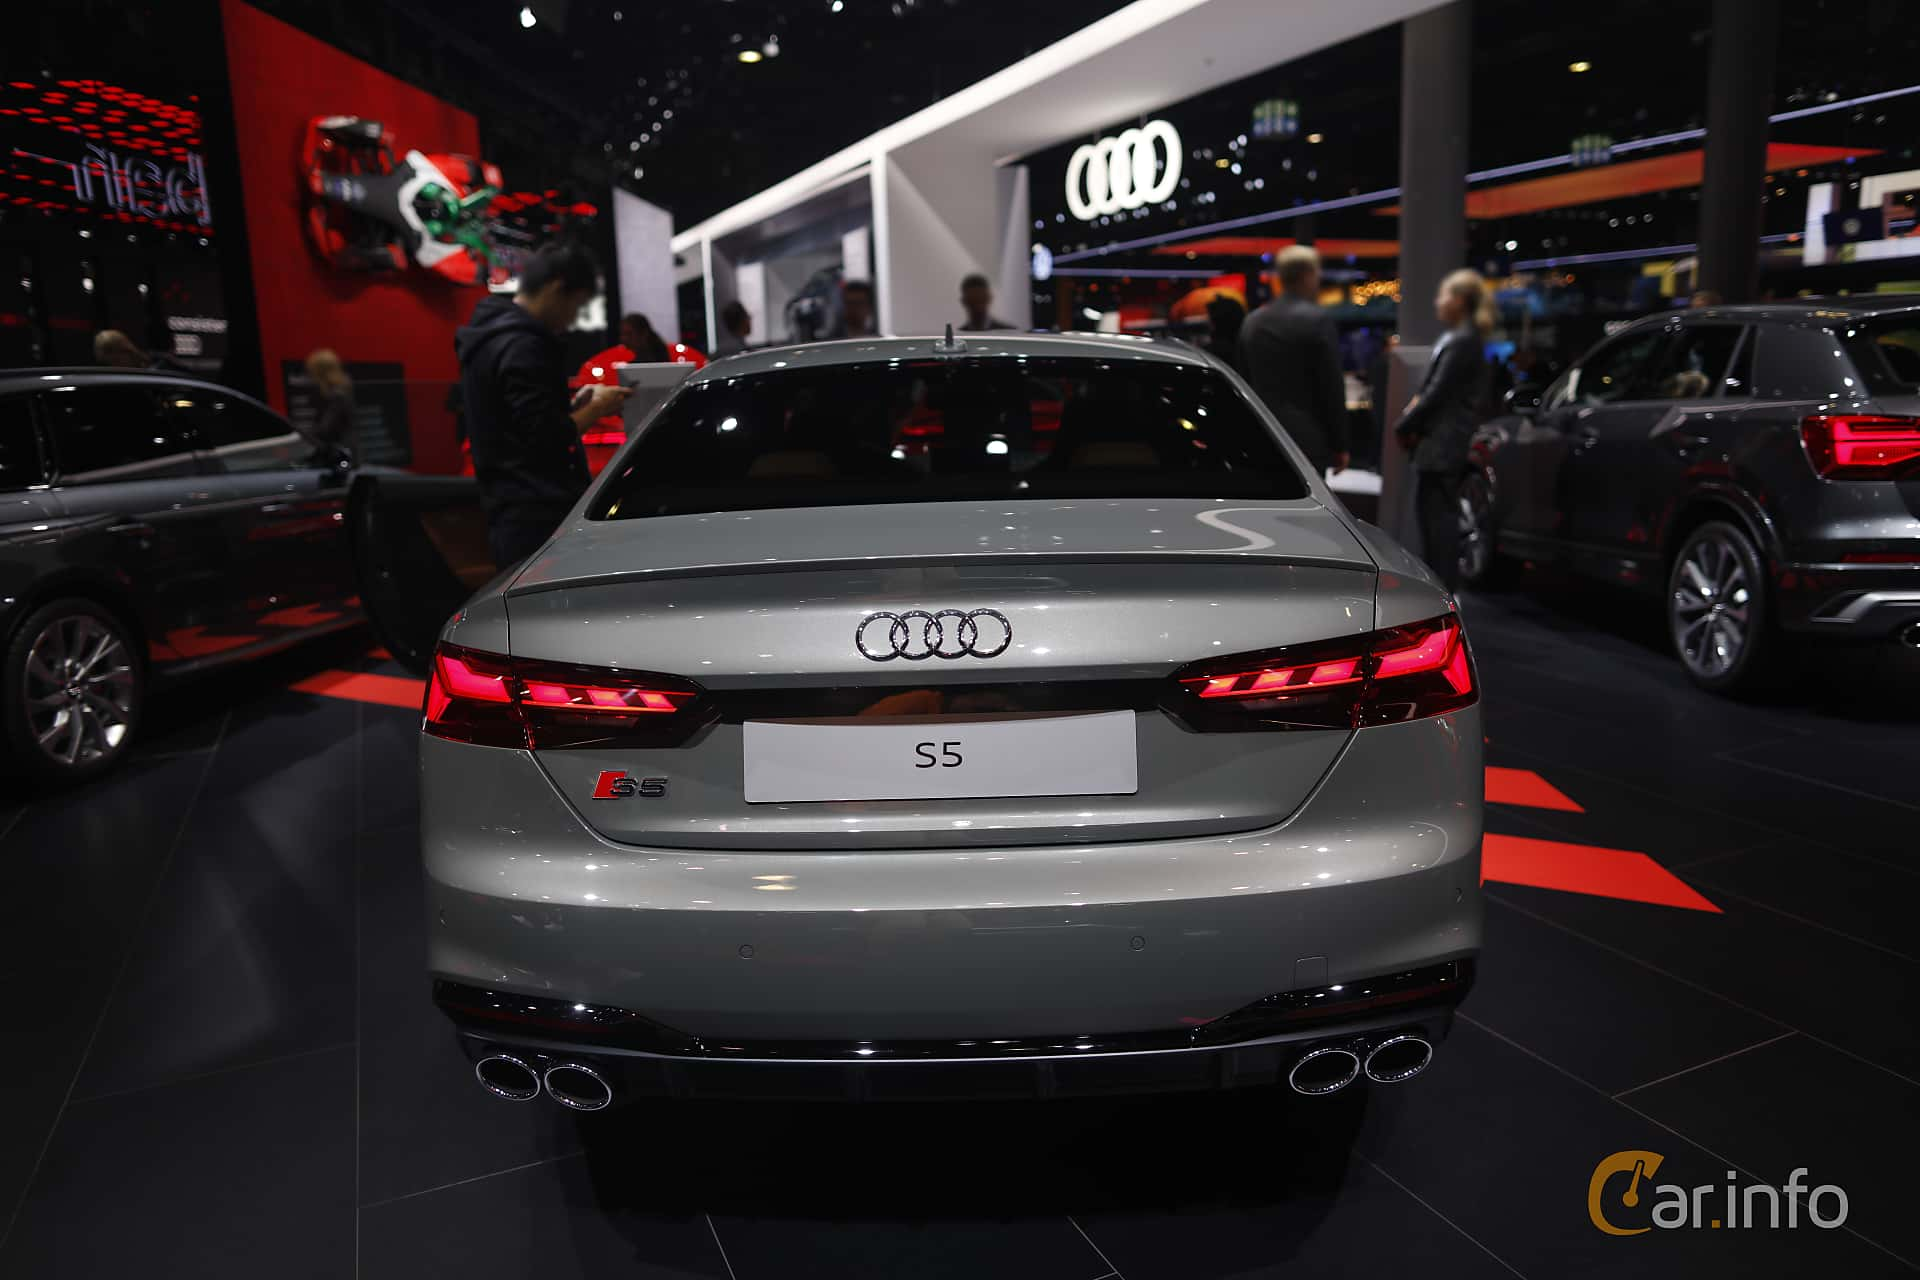 Audi S5 TDI Coupé 3.0 TDI quattro TipTronic, 347hp, 2020 at IAA 2019